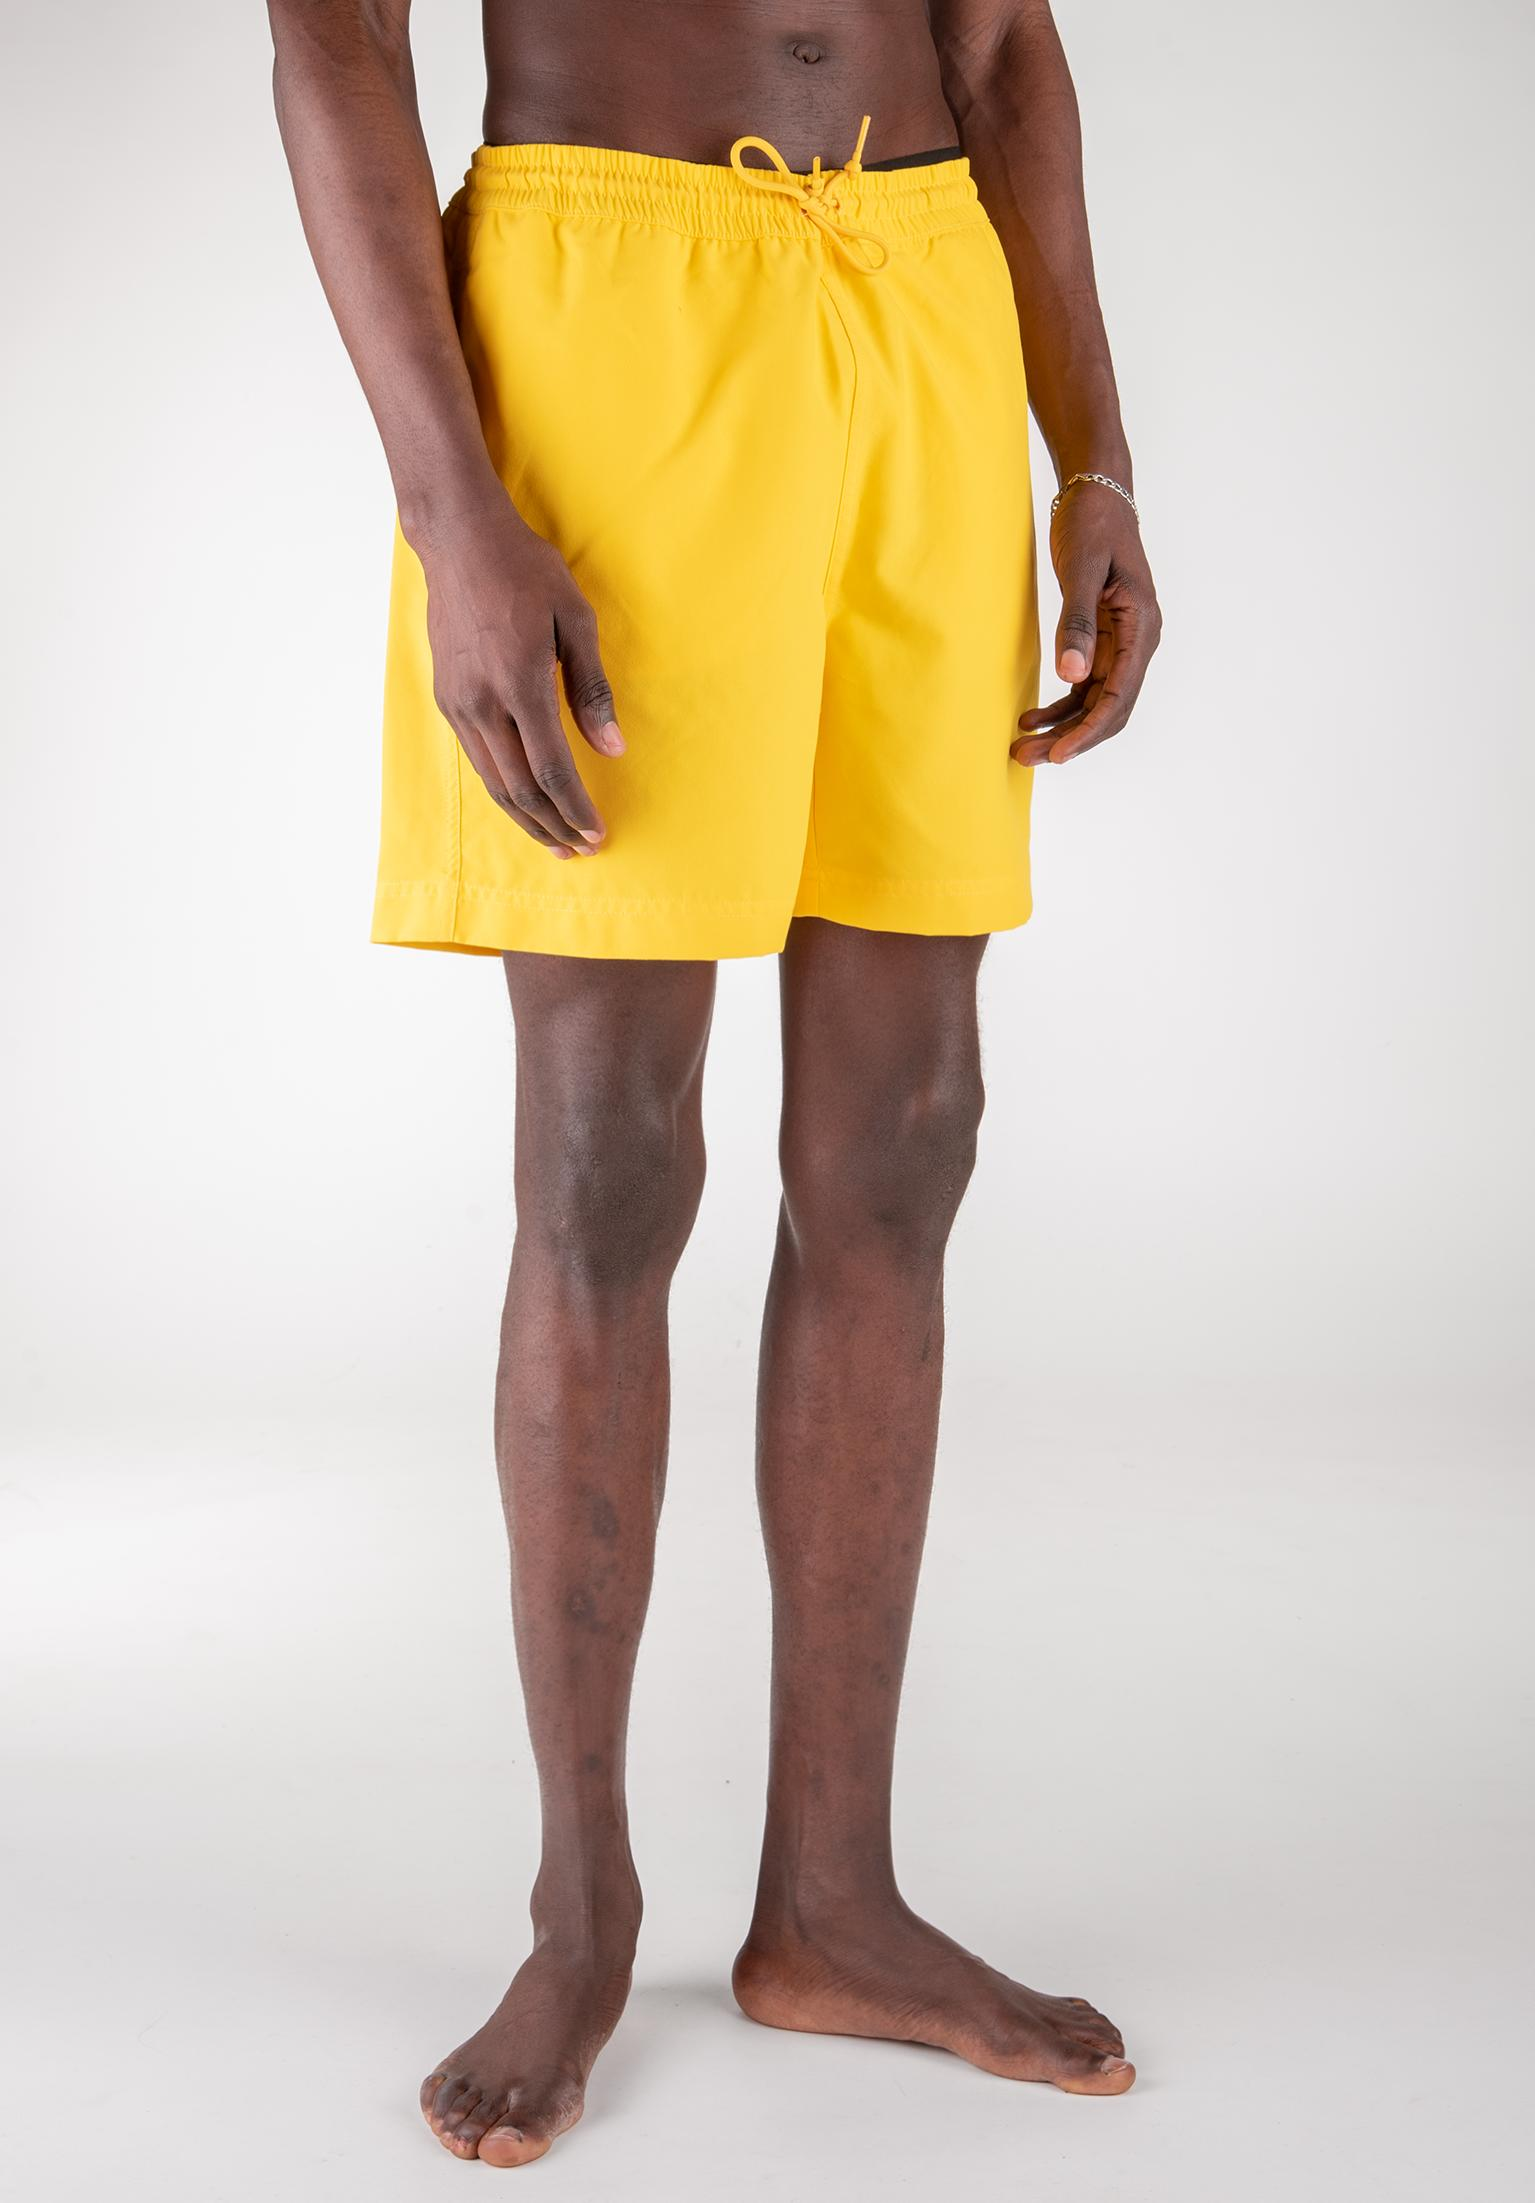 228c80031e Chase Swim Trunk Carhartt WIP Beachwear in primula-gold for Men   Titus